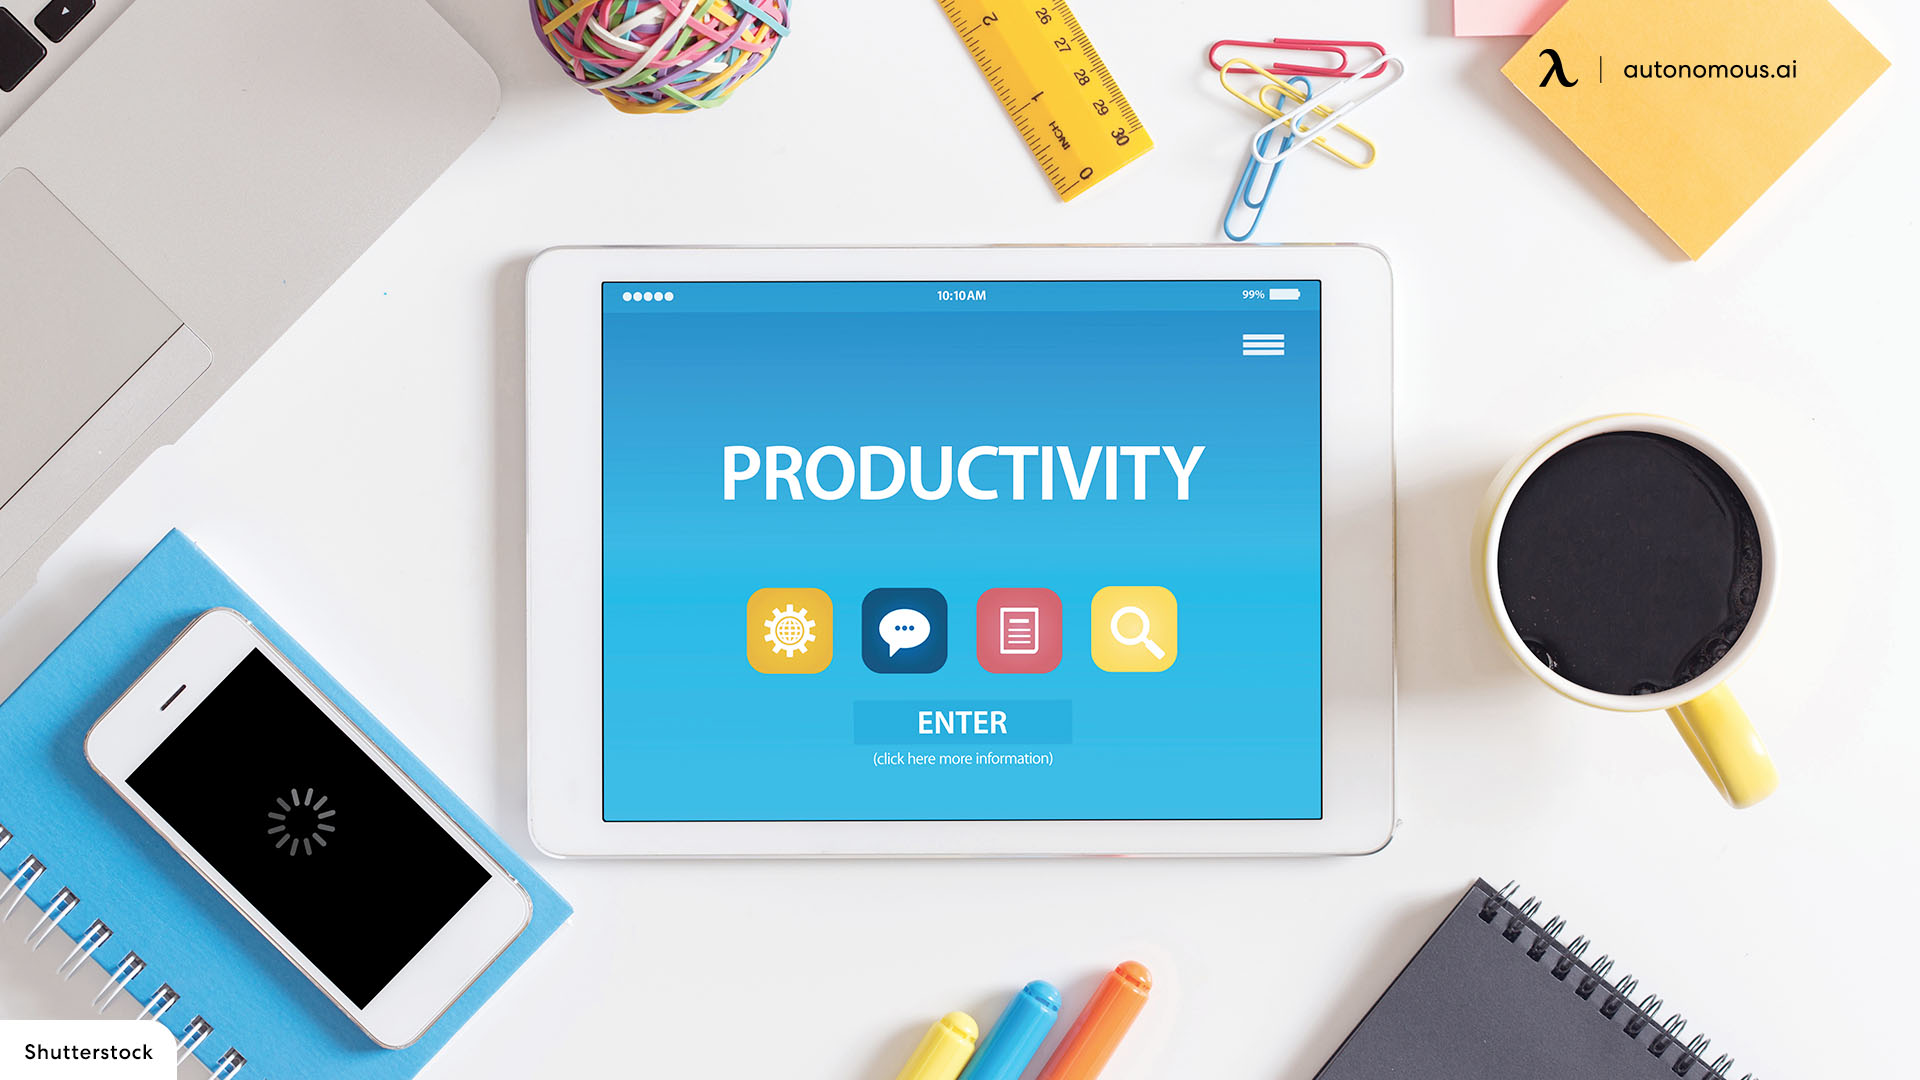 Loss in Productivity